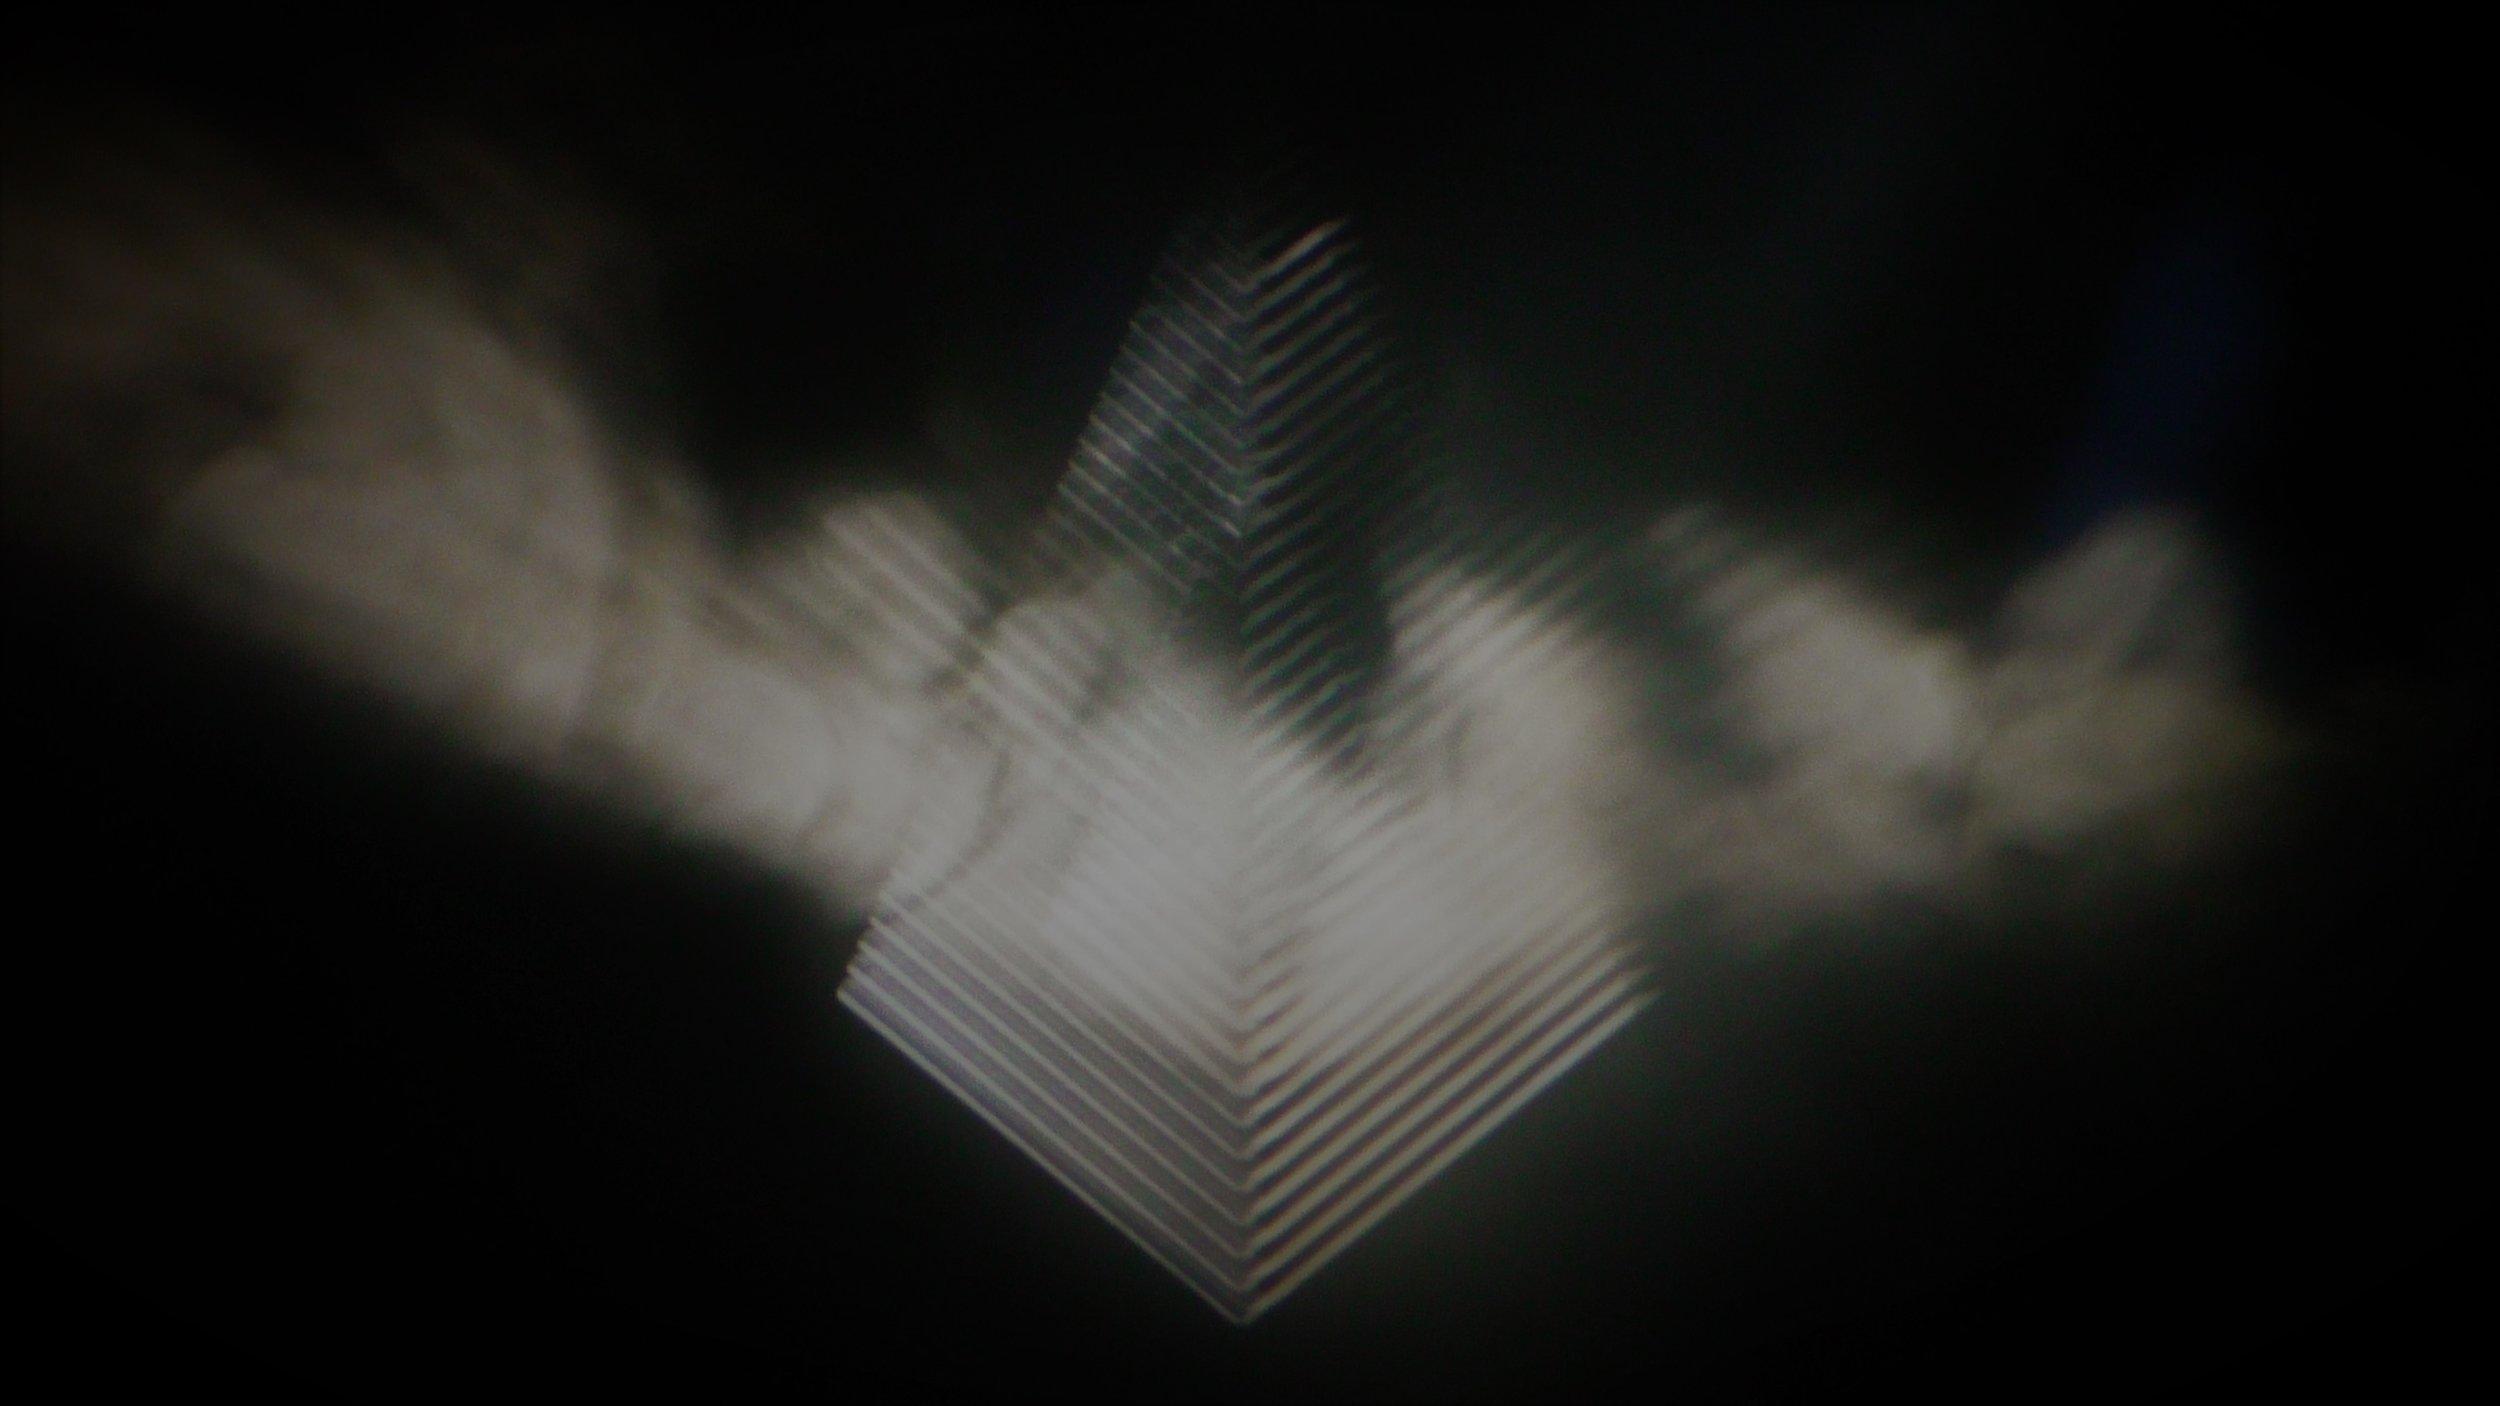 pic 003 - Kiasmos Projection Symbol.jpg